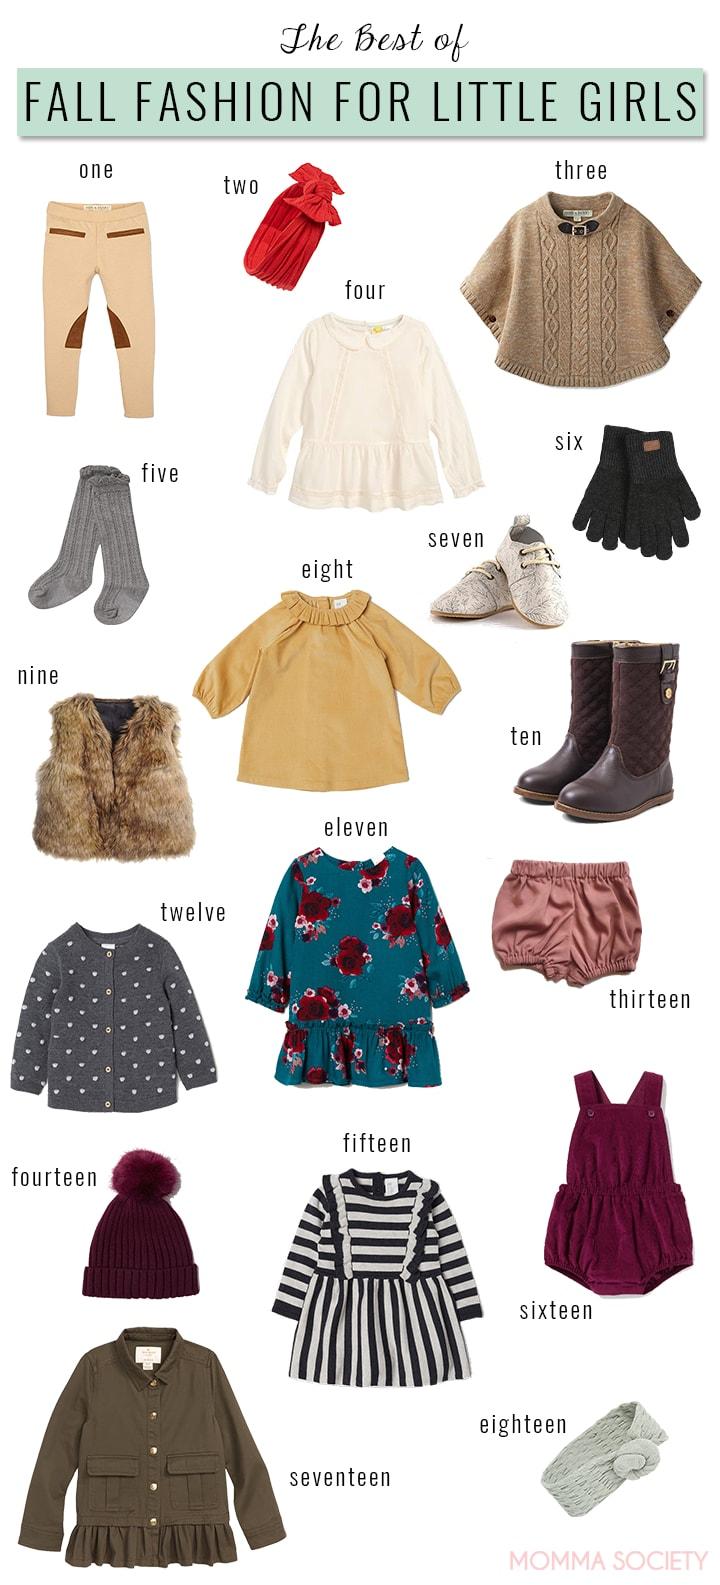 Fall Fashion for Little Girls.jpg